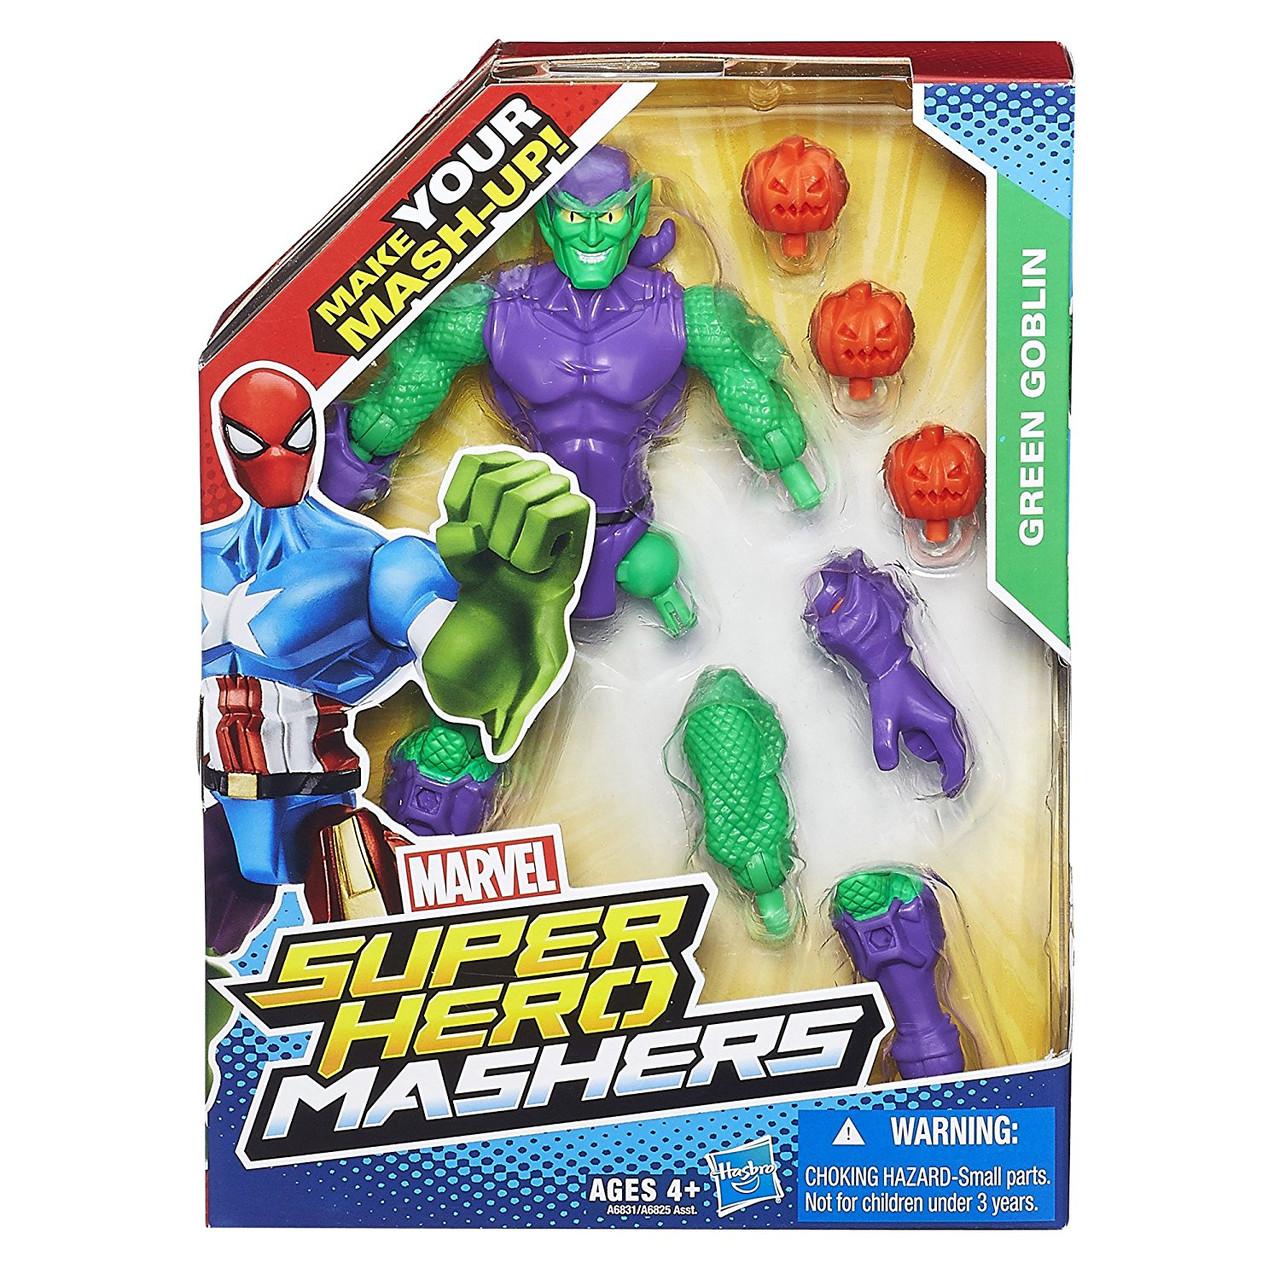 Разборная фигурка супергероя Зеленый Гоблин - Green Goblin, Marvel, Mashers, Hasbro